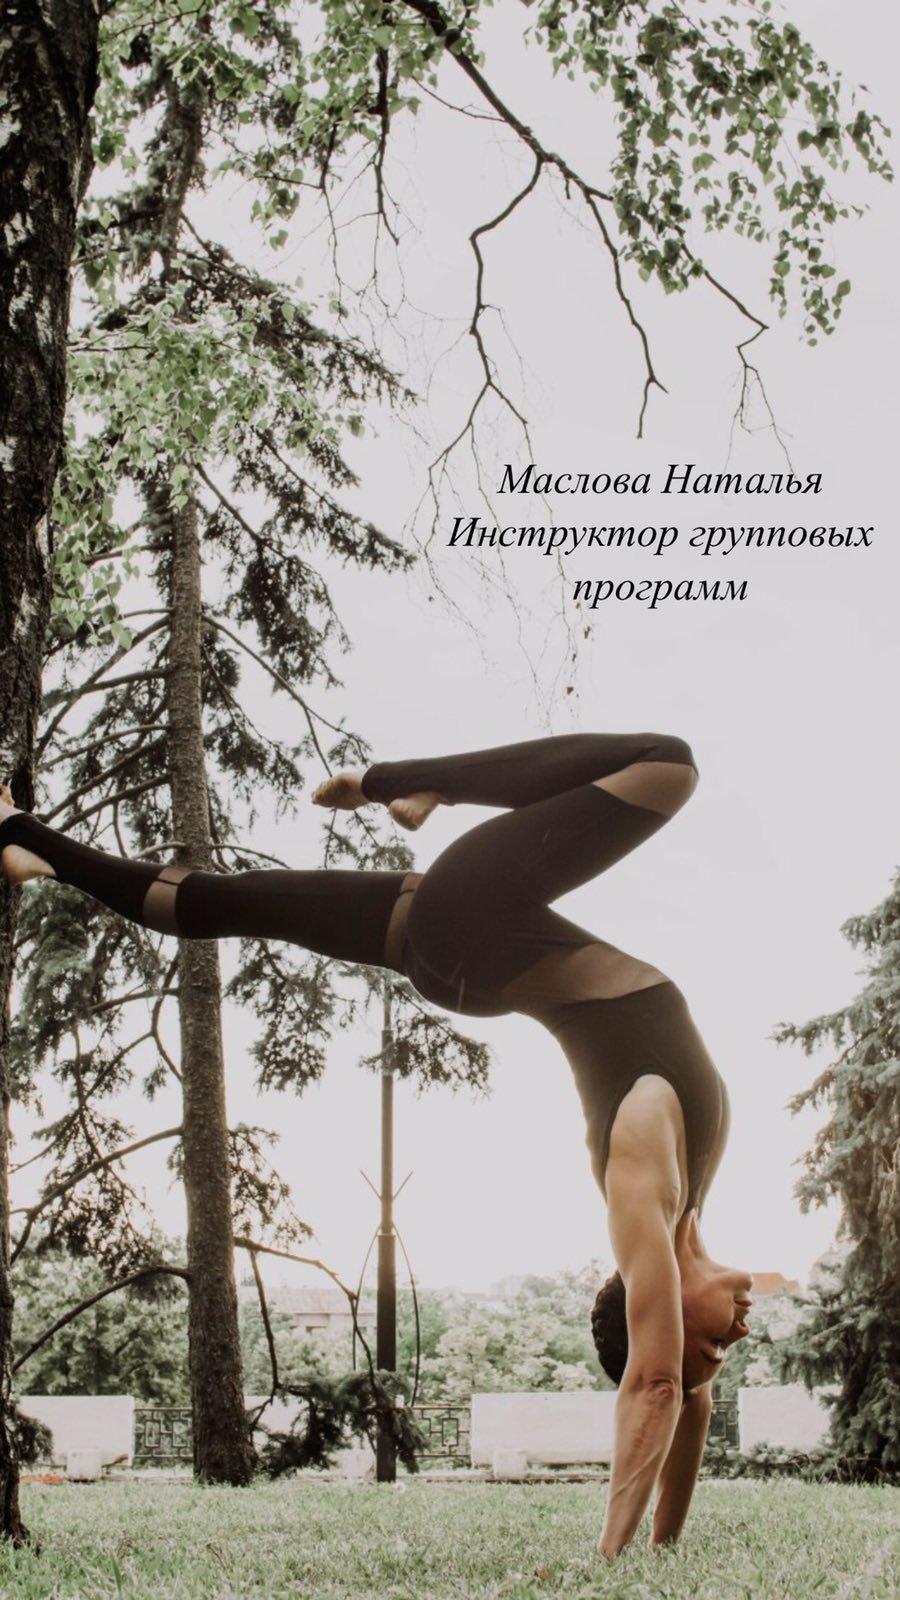 Танцы в Лозовой от А до Я: куда, когда и как?, фото-10